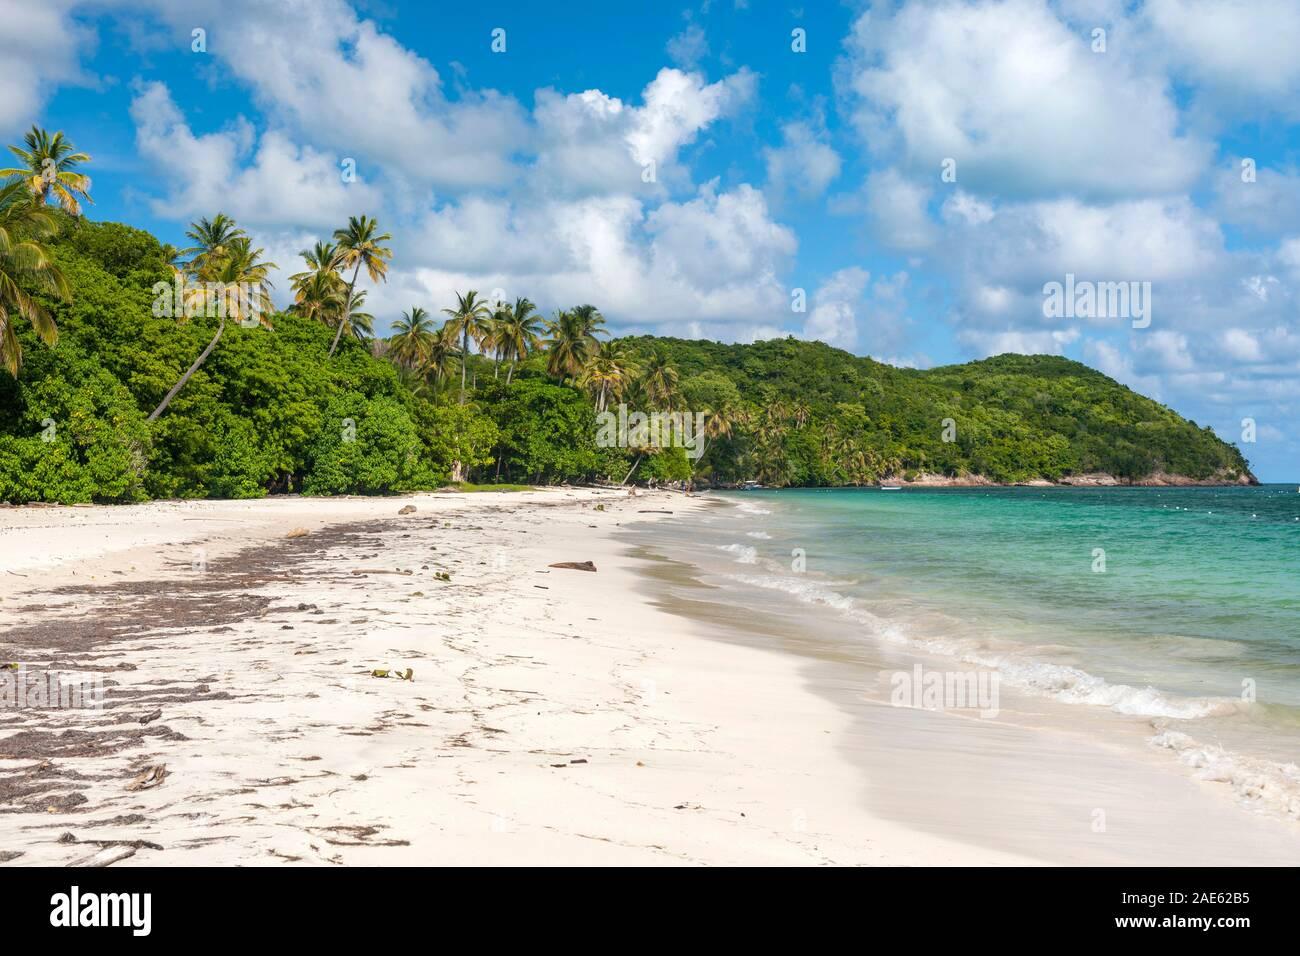 Manzanillo beach on the island of Providencia in Colombia. Stock Photo